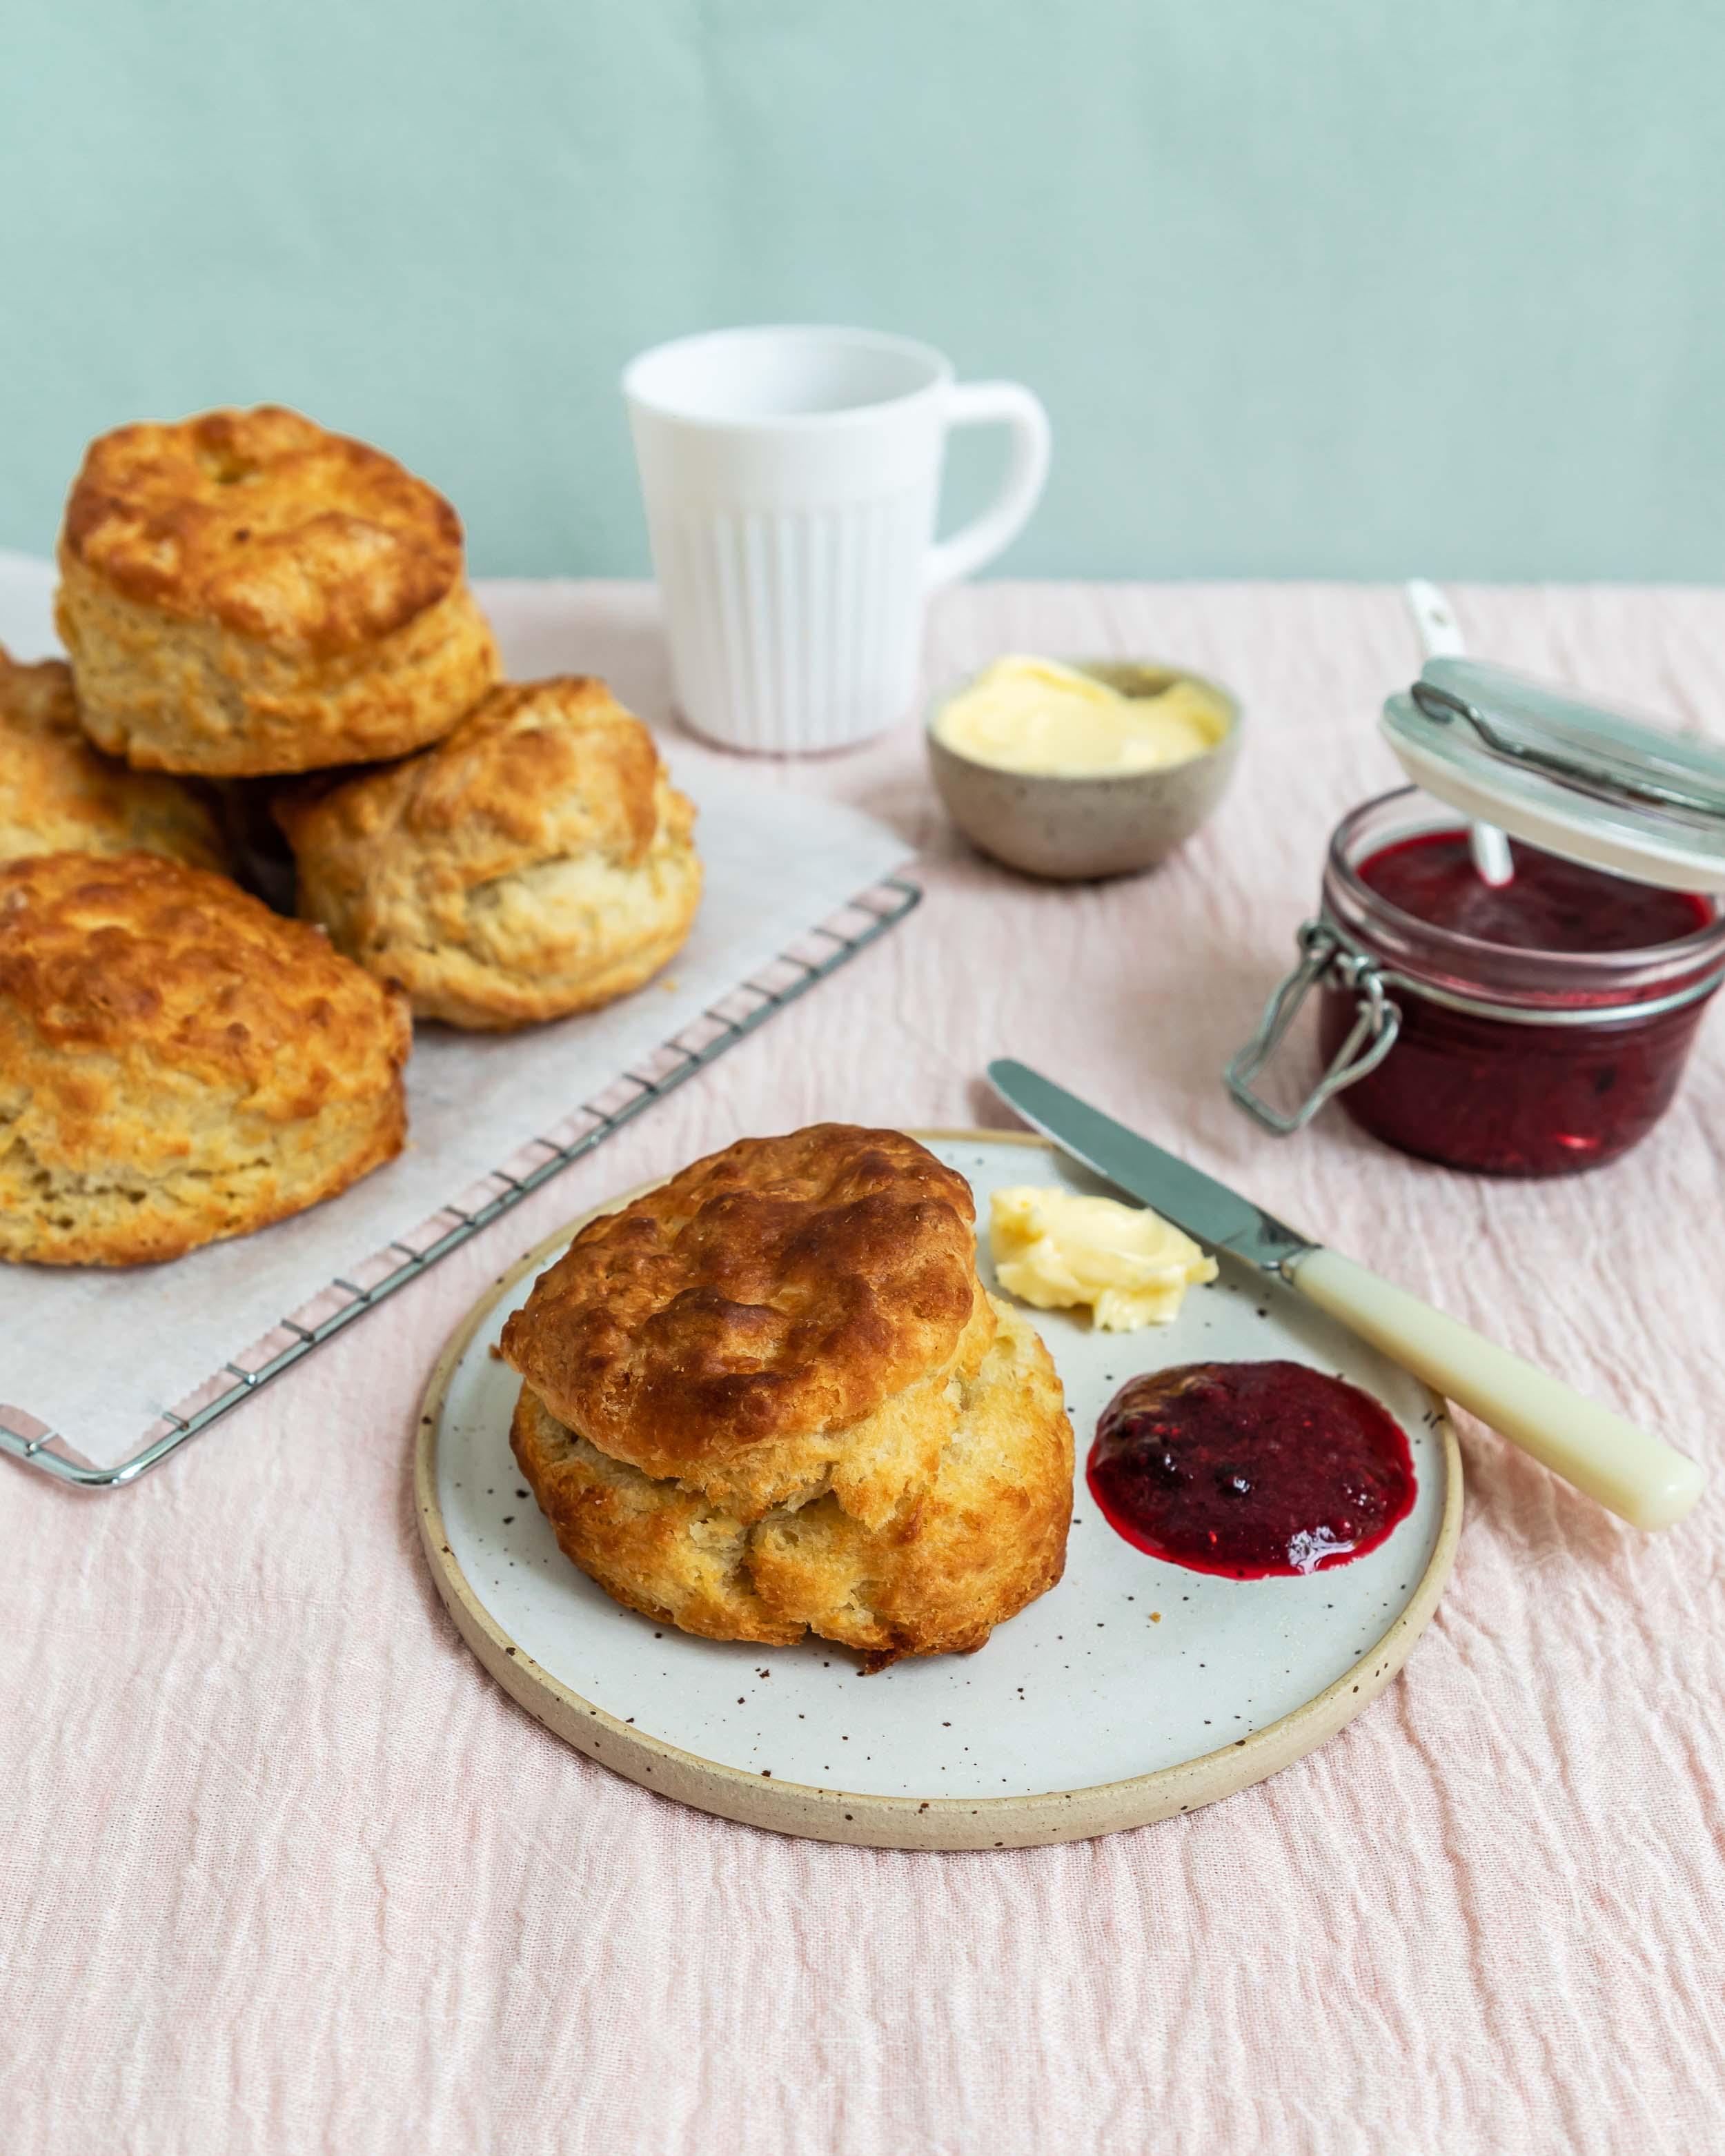 brittons bakery | verdenius | 143A1434.jpg